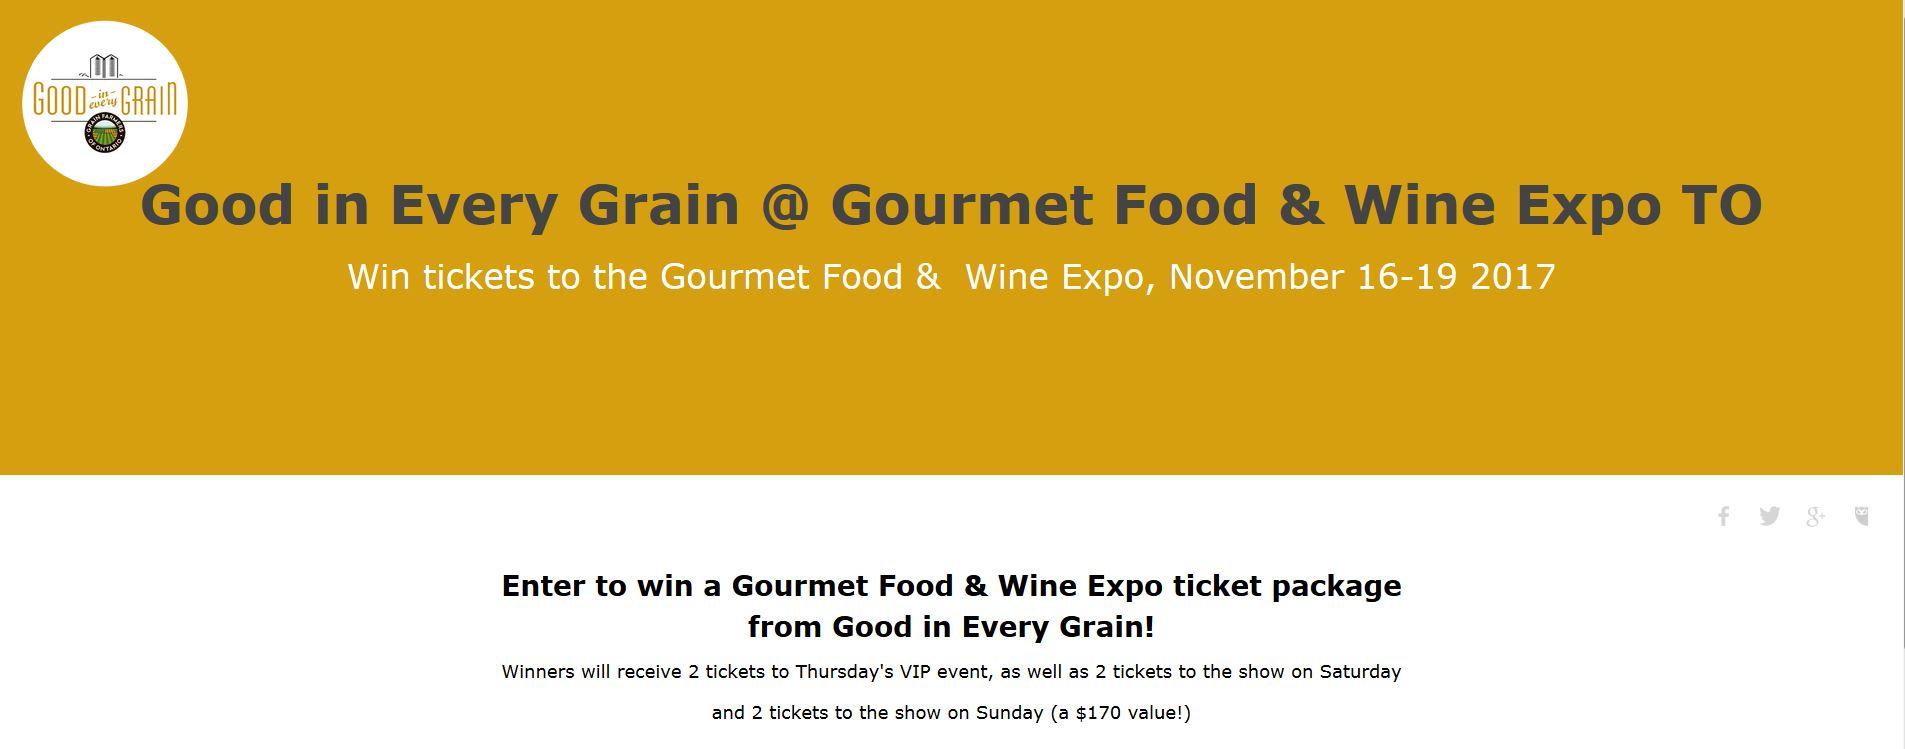 Gourmet food & wine expo contest